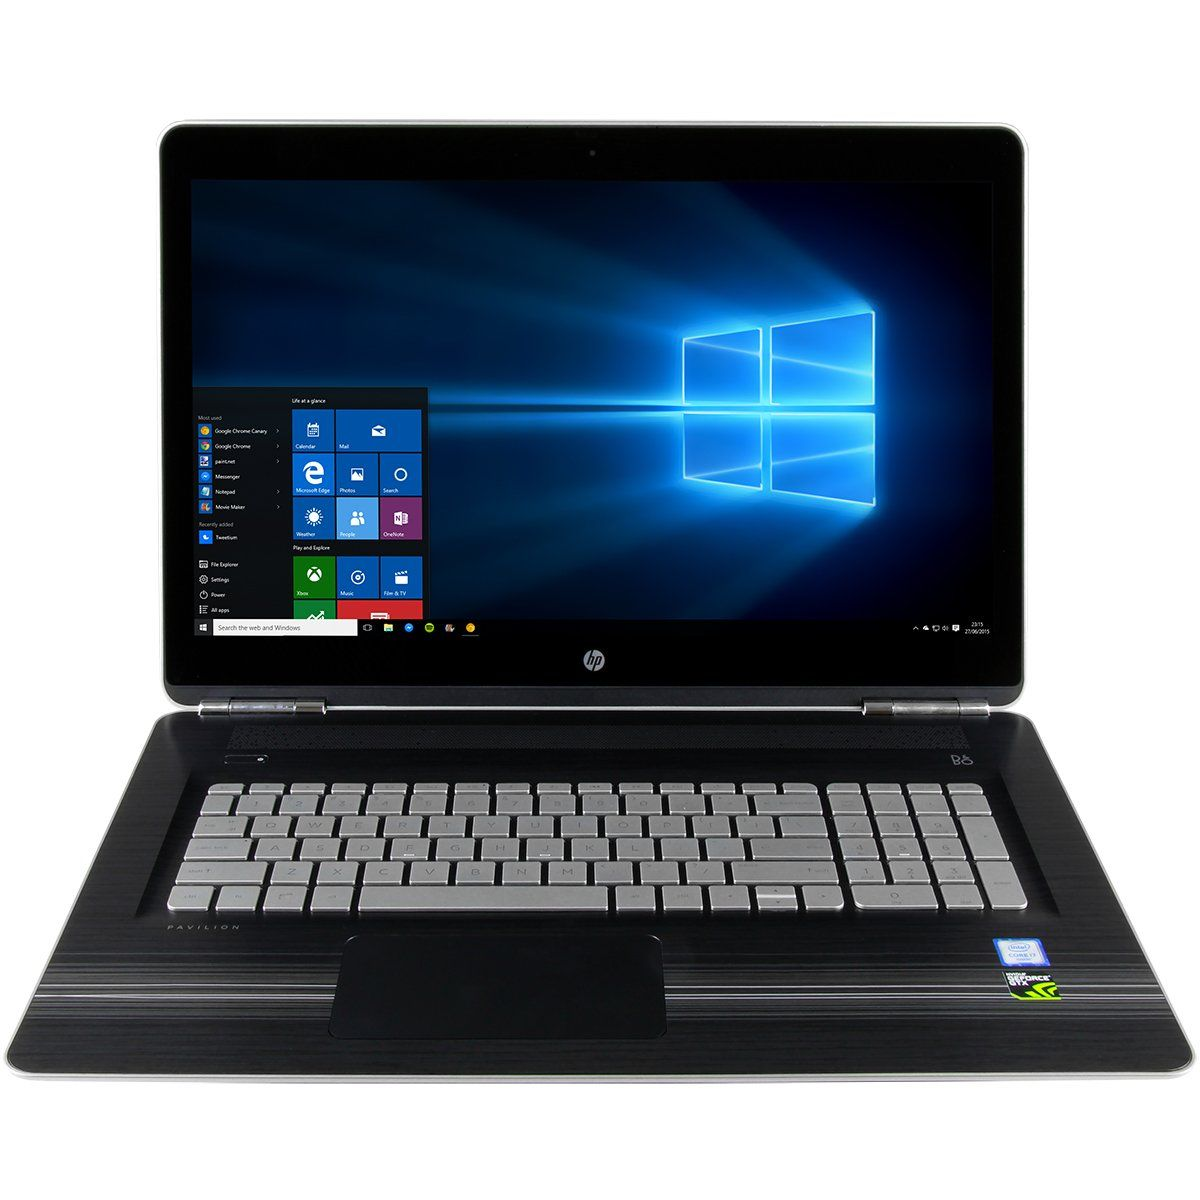 Cuk Hp Pavilion 17 Gamer 17 3 Notebook Intel Skylake I7 7700hq 32gb Ram 256gb Nvme Ssd 1tb Hdd Nvidia Gtx 1050 4g Laptop Laptop Windows Laptop Computers